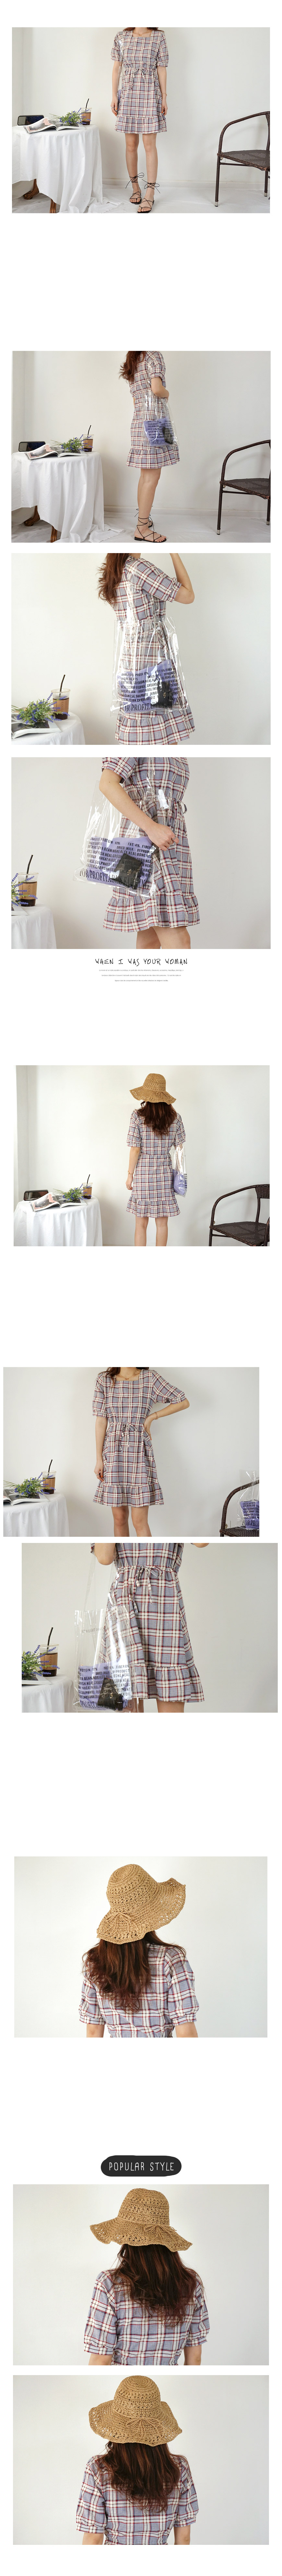 Ribbon Strap Check Ruffle Midi Long Square Dress 2color